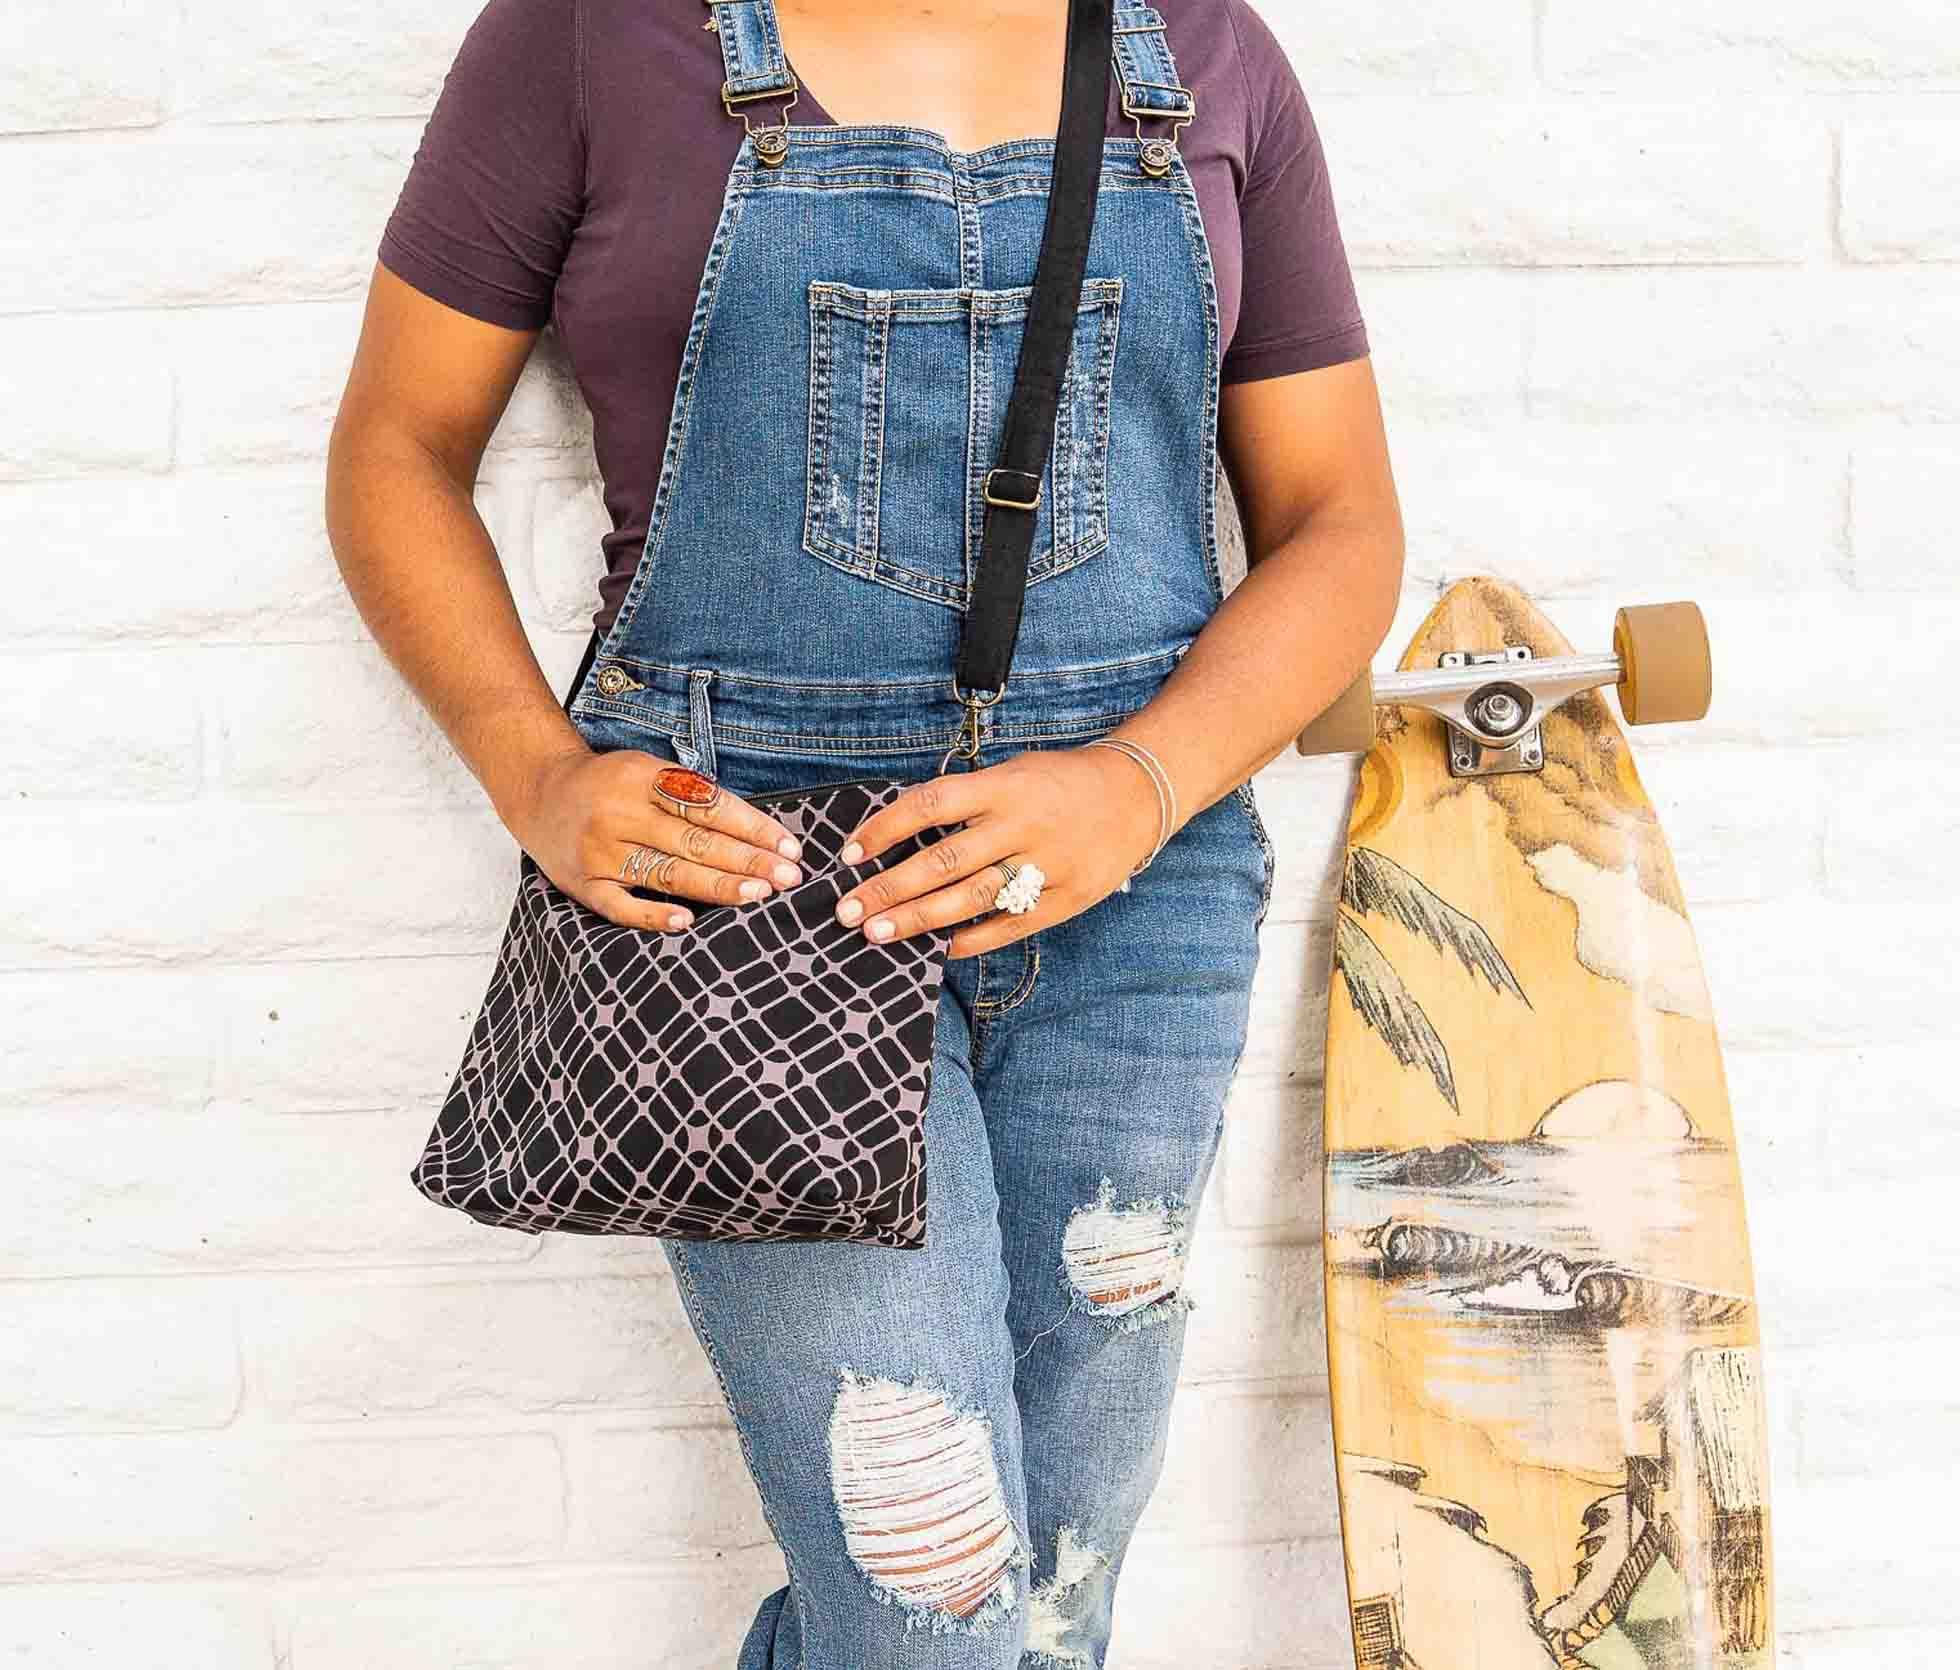 cute purse and skateboard